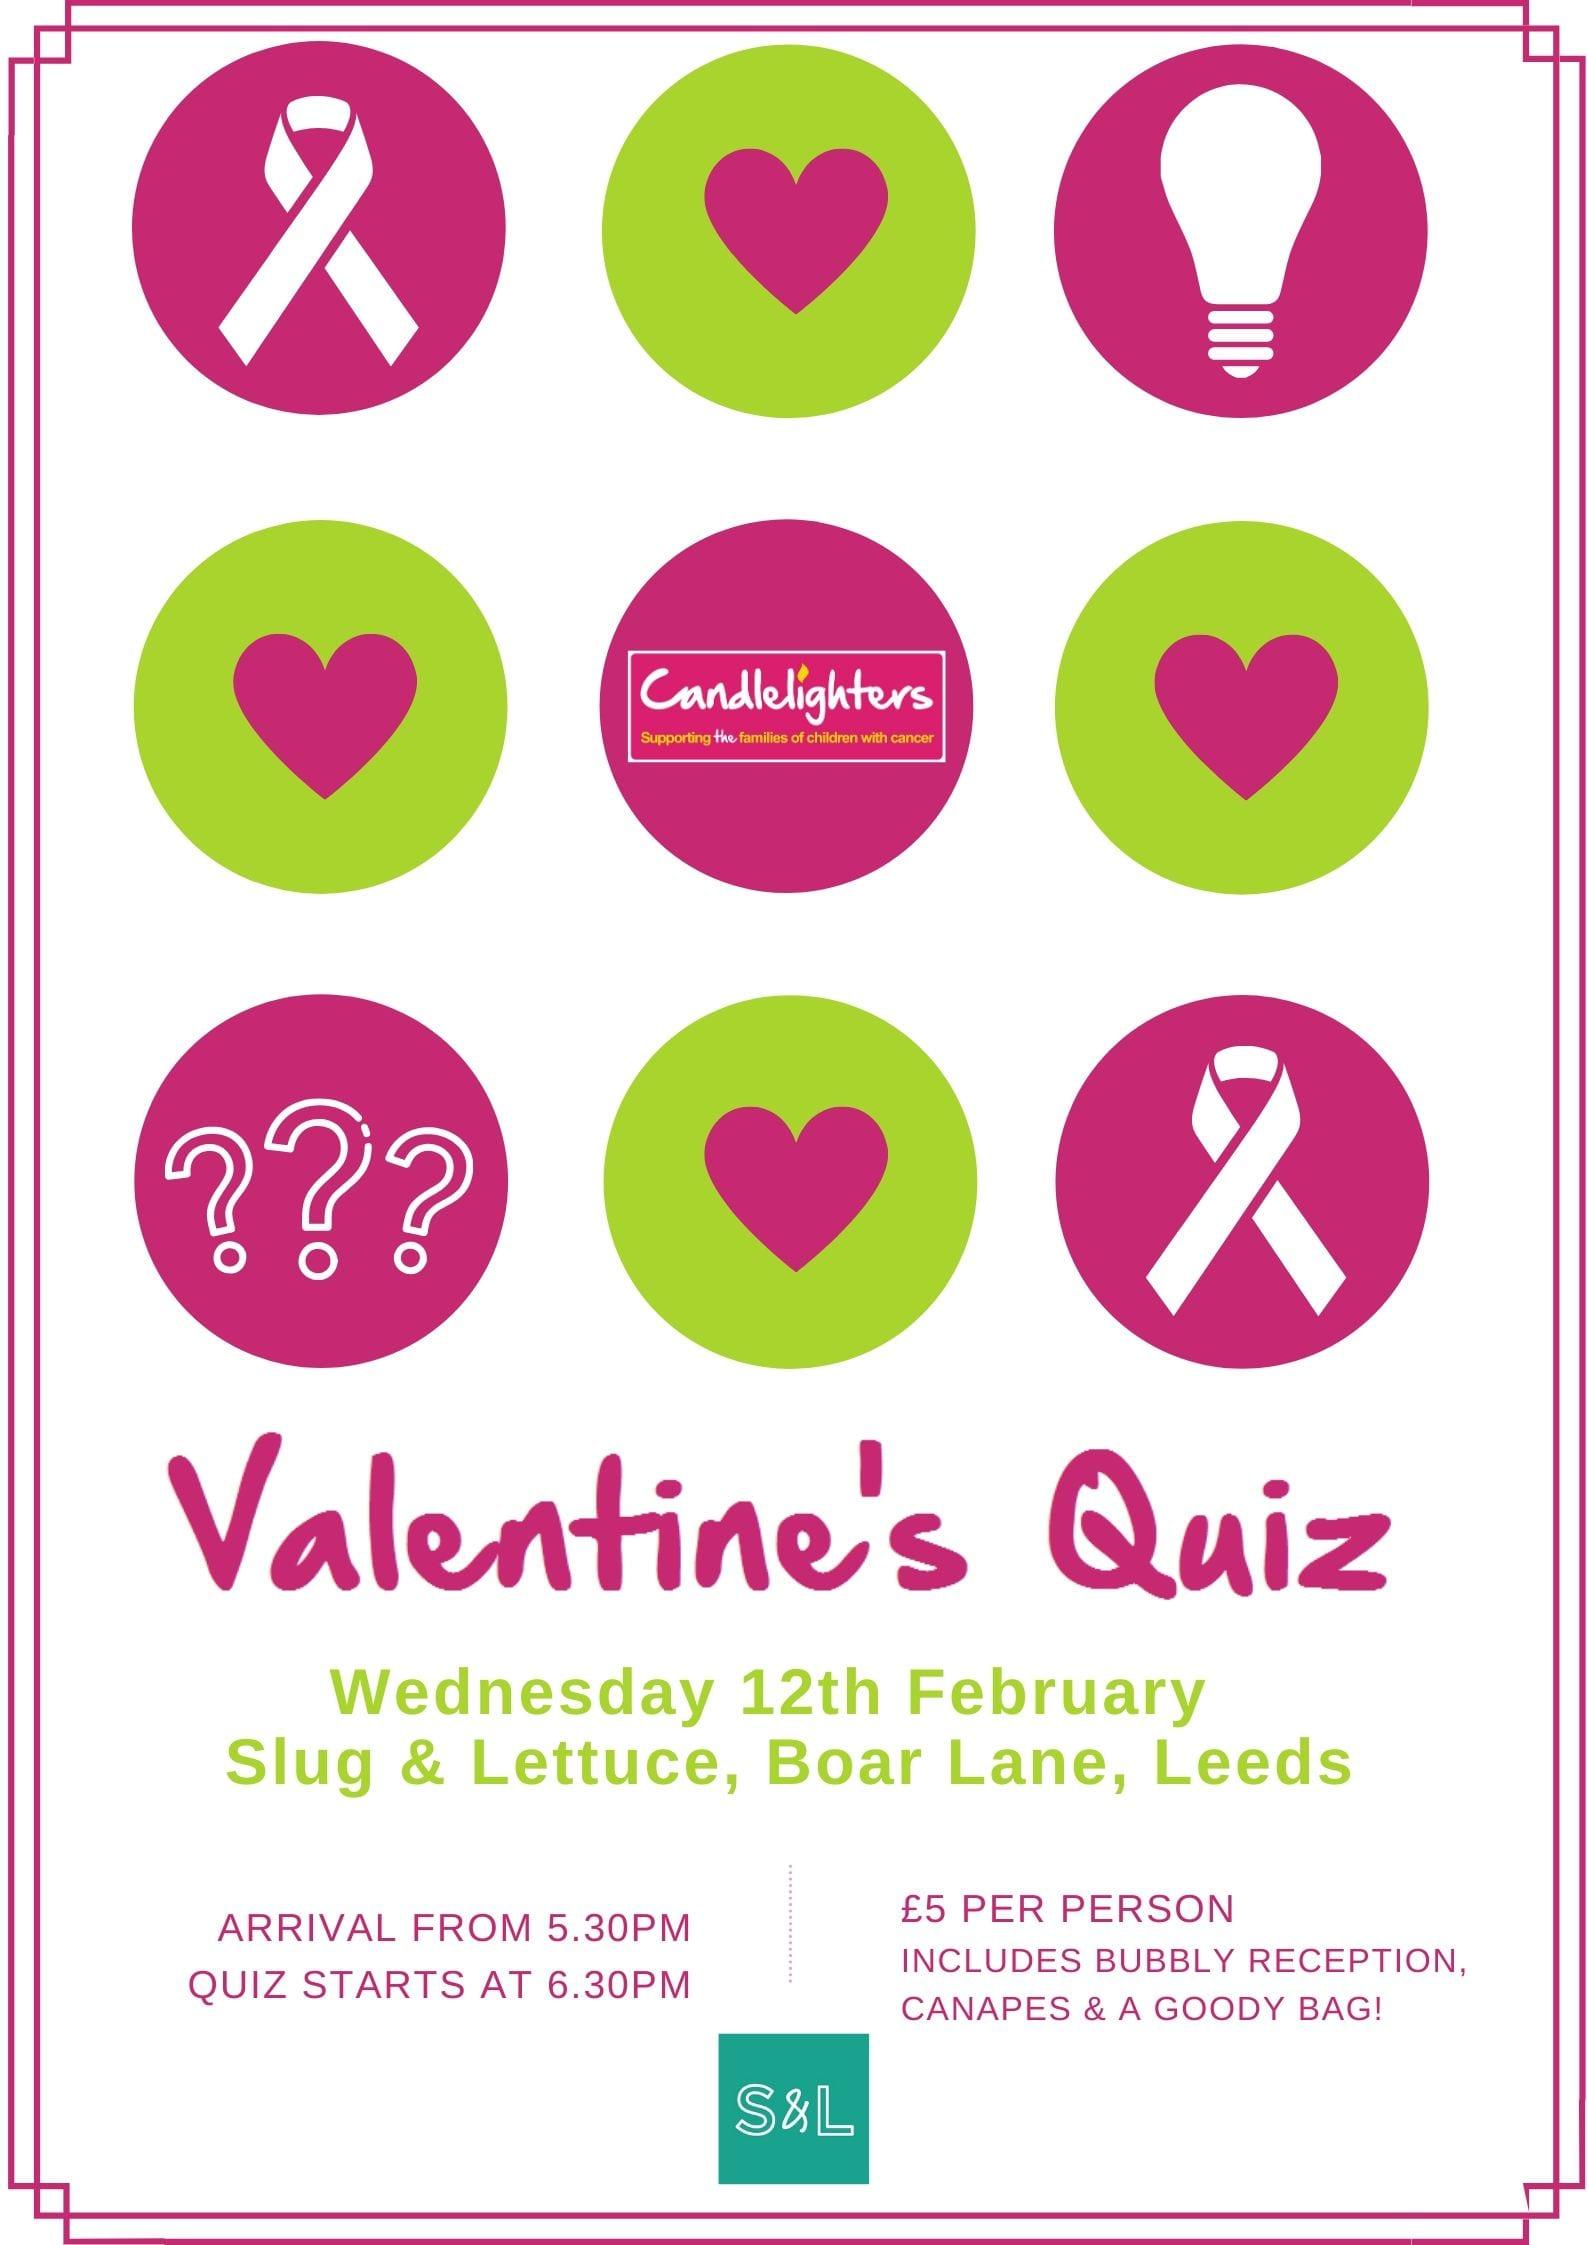 Valentine's Quiz at Slug and Lettuce!